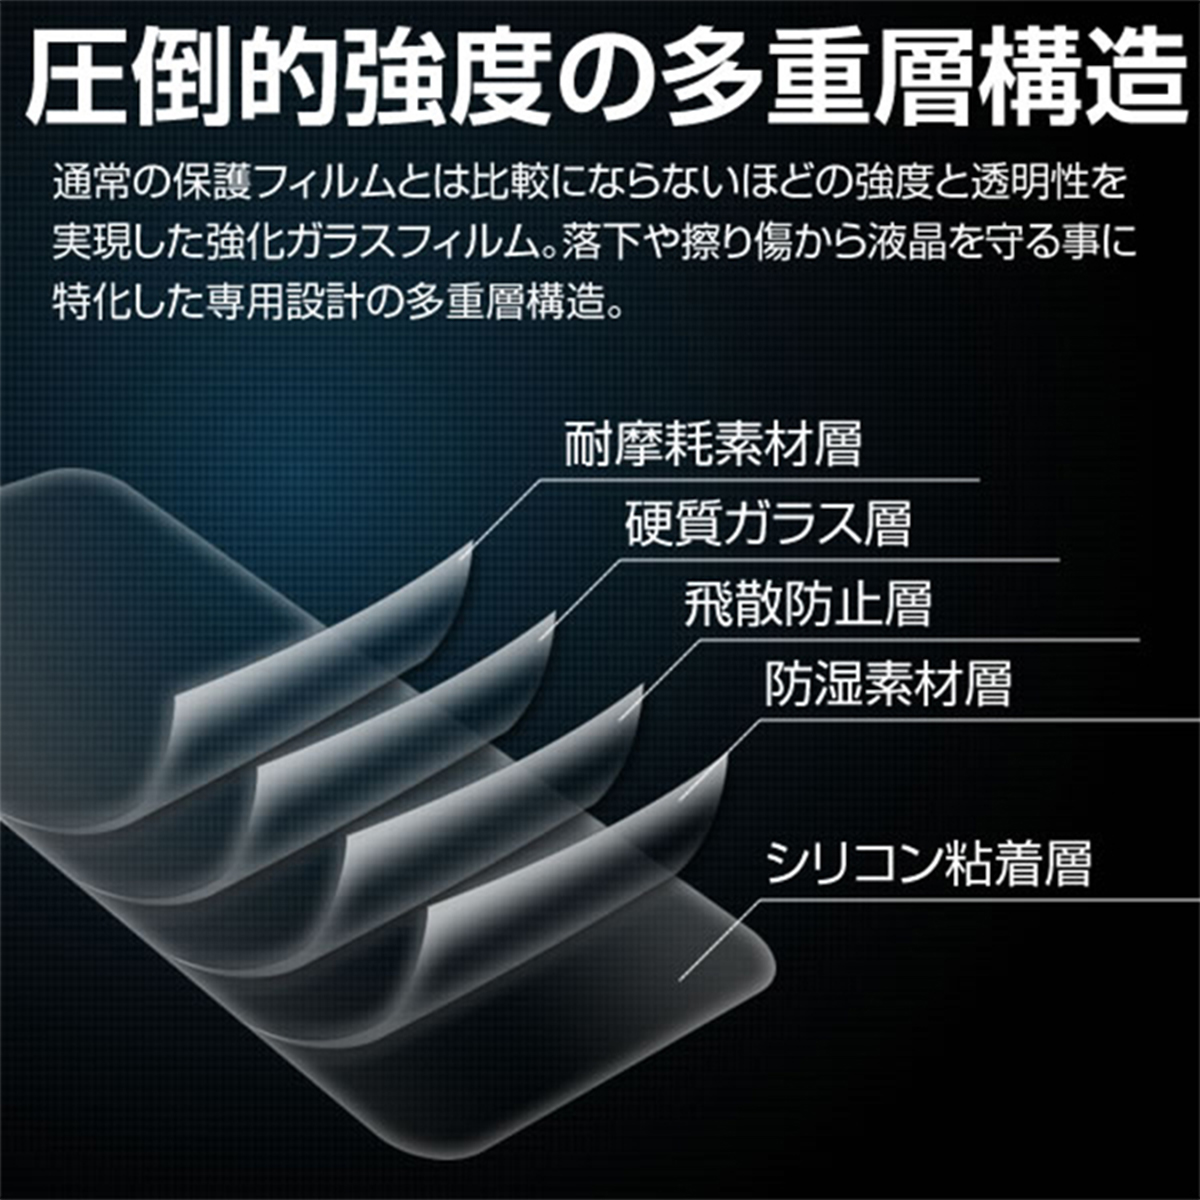 AQUOS sense4 SH-41A 強化ガラス保護フィルム 9H